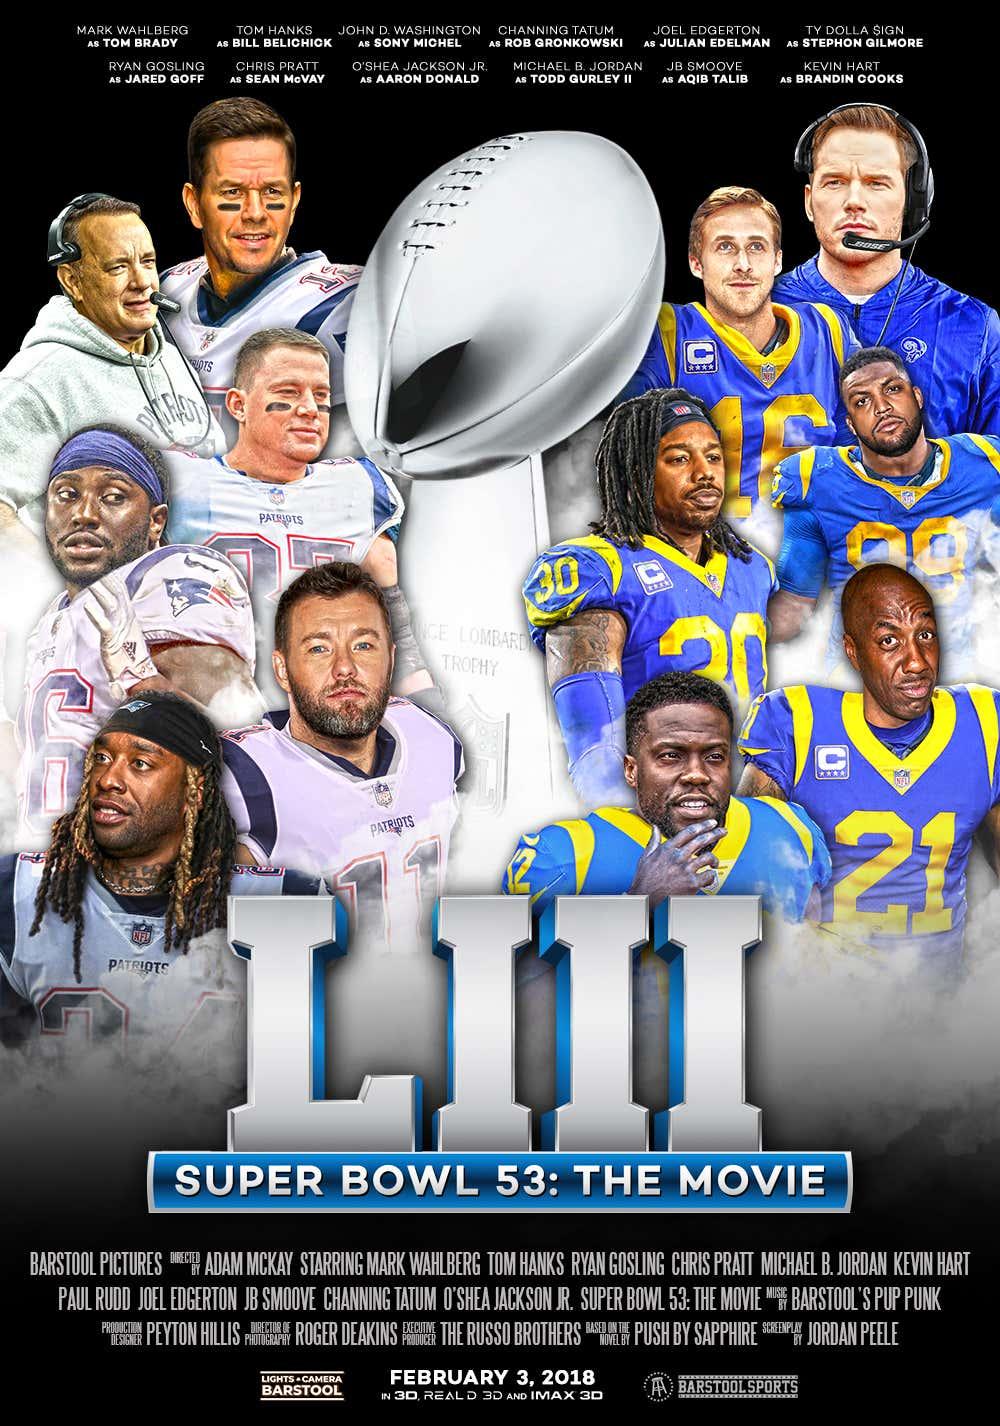 6f8ba15fea9 Casting The Super Bowl 53 Patriots-Rams Movie - Barstool Sports